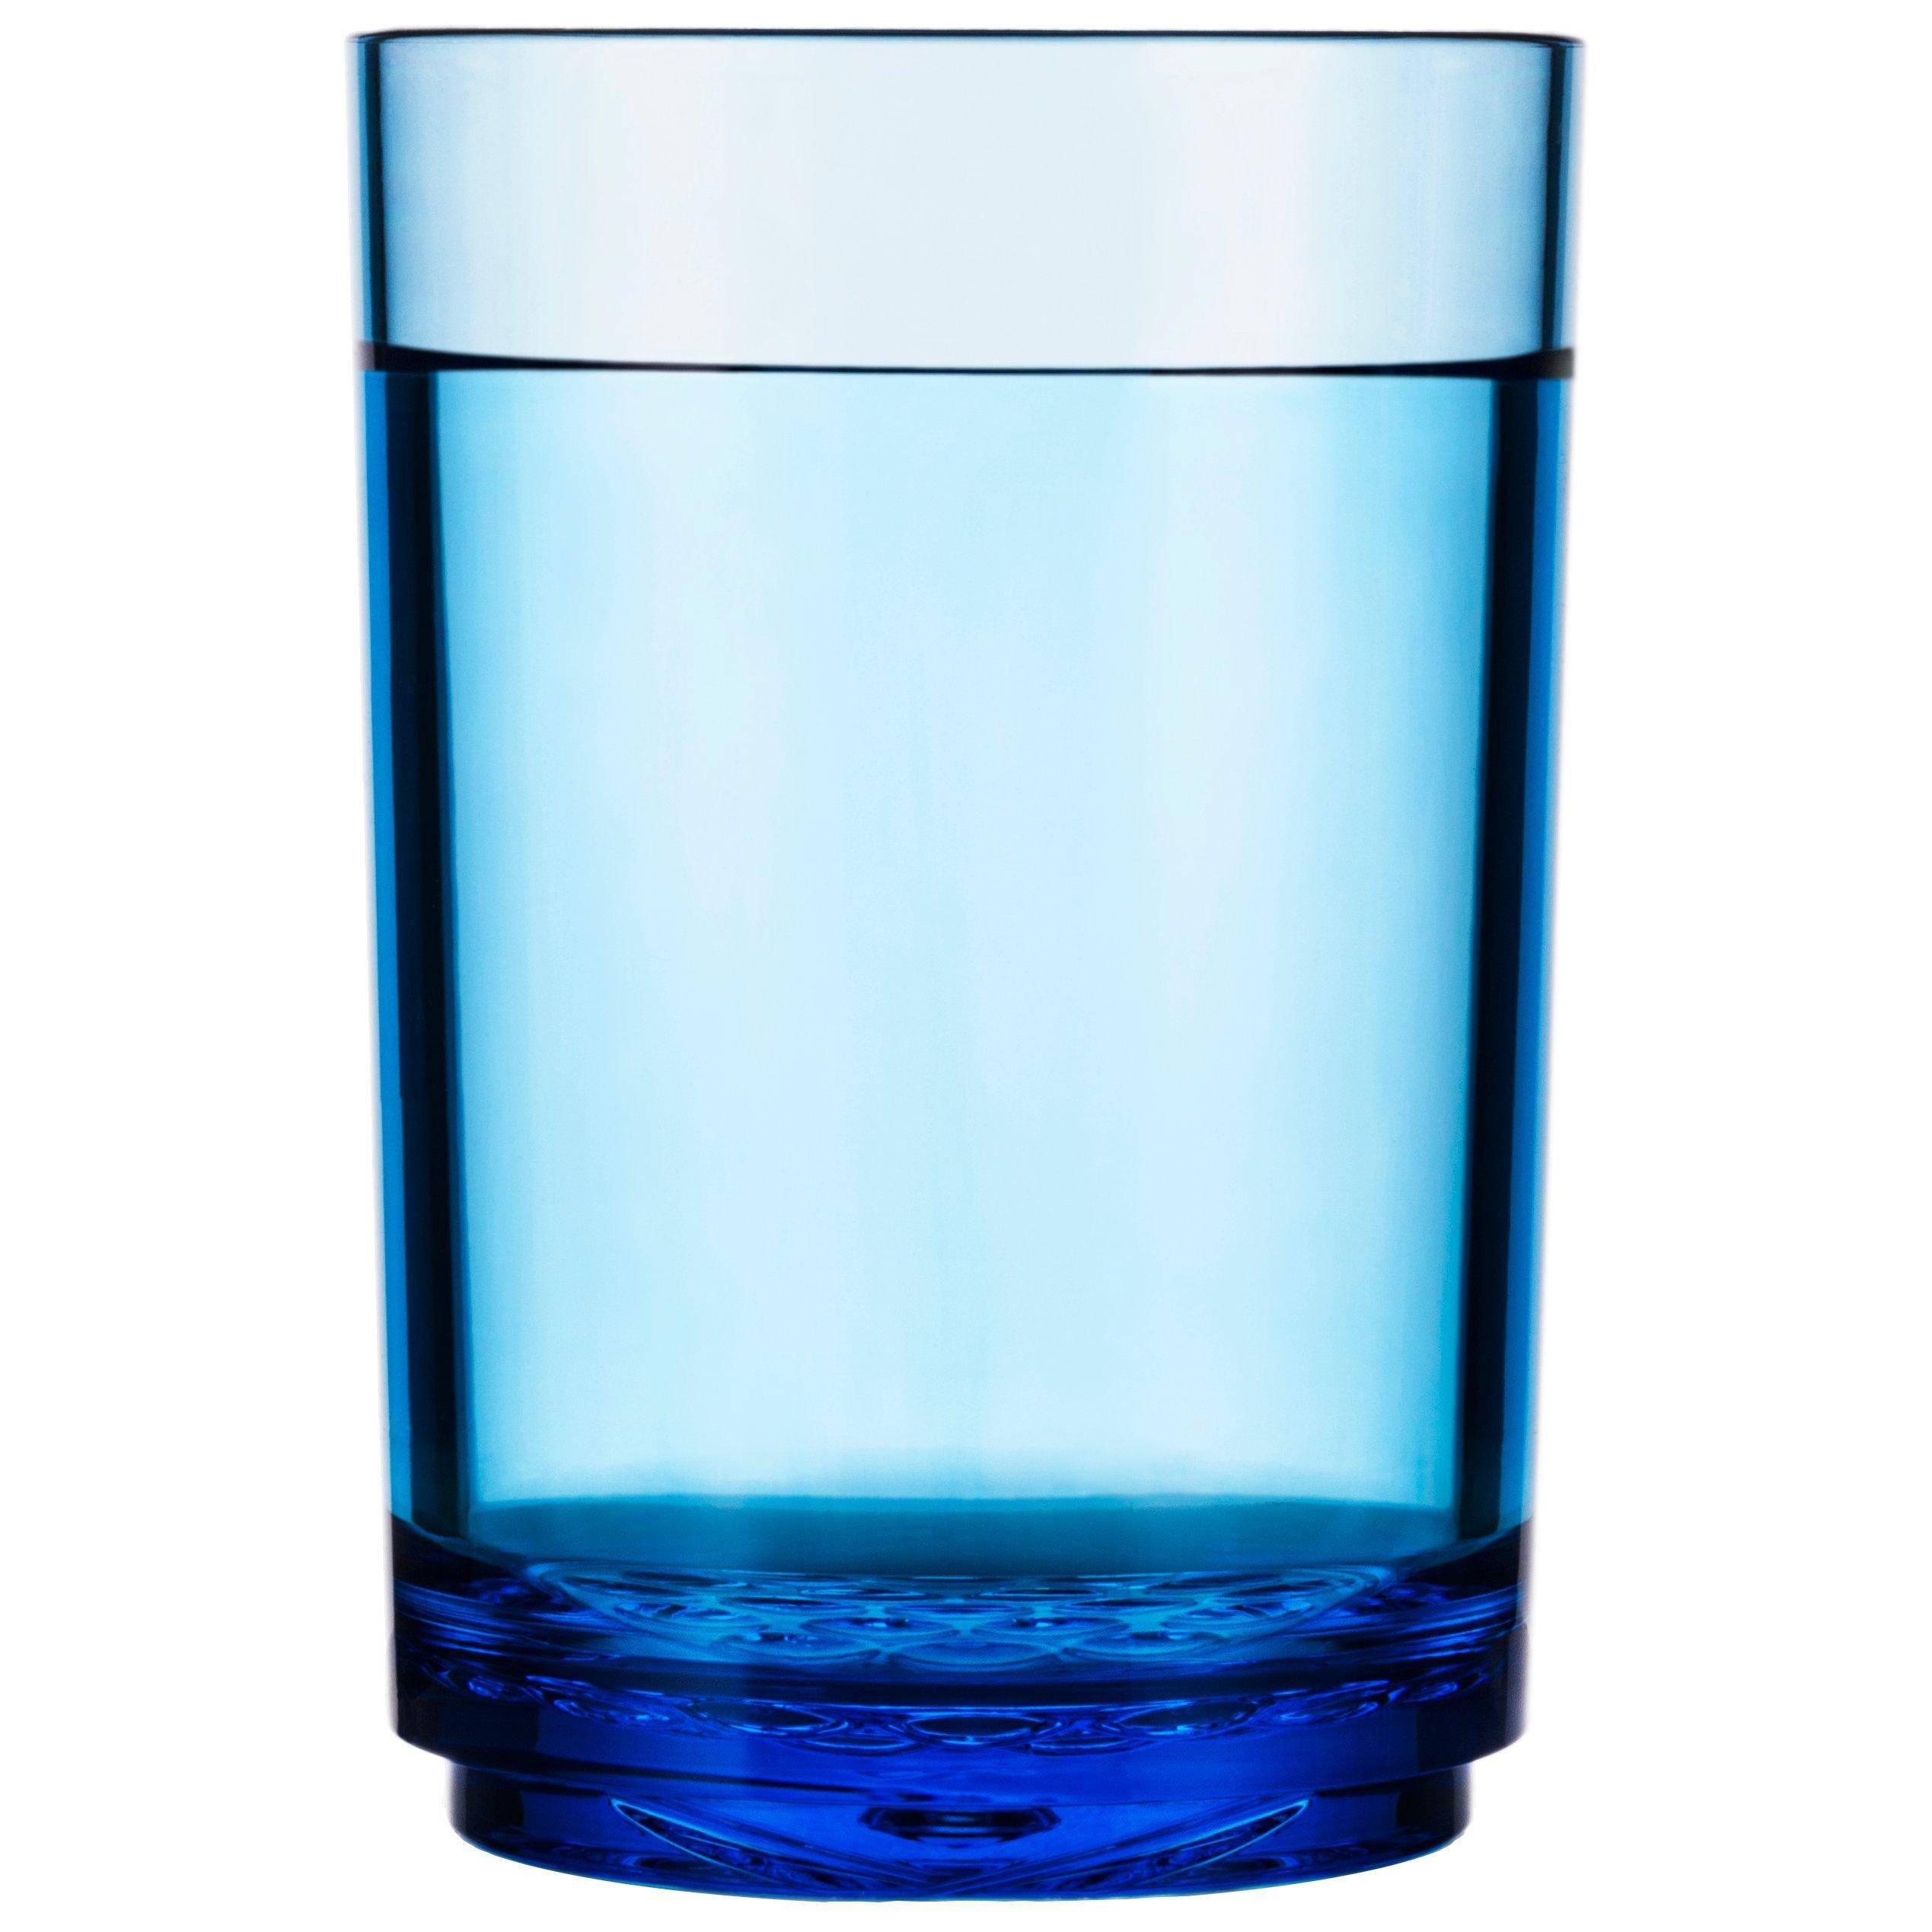 Drinique ELT-PT-BLU-4 Elite Pint Unbreakable Tritan Beer Glasses, 16 oz (Set of 4), Blue